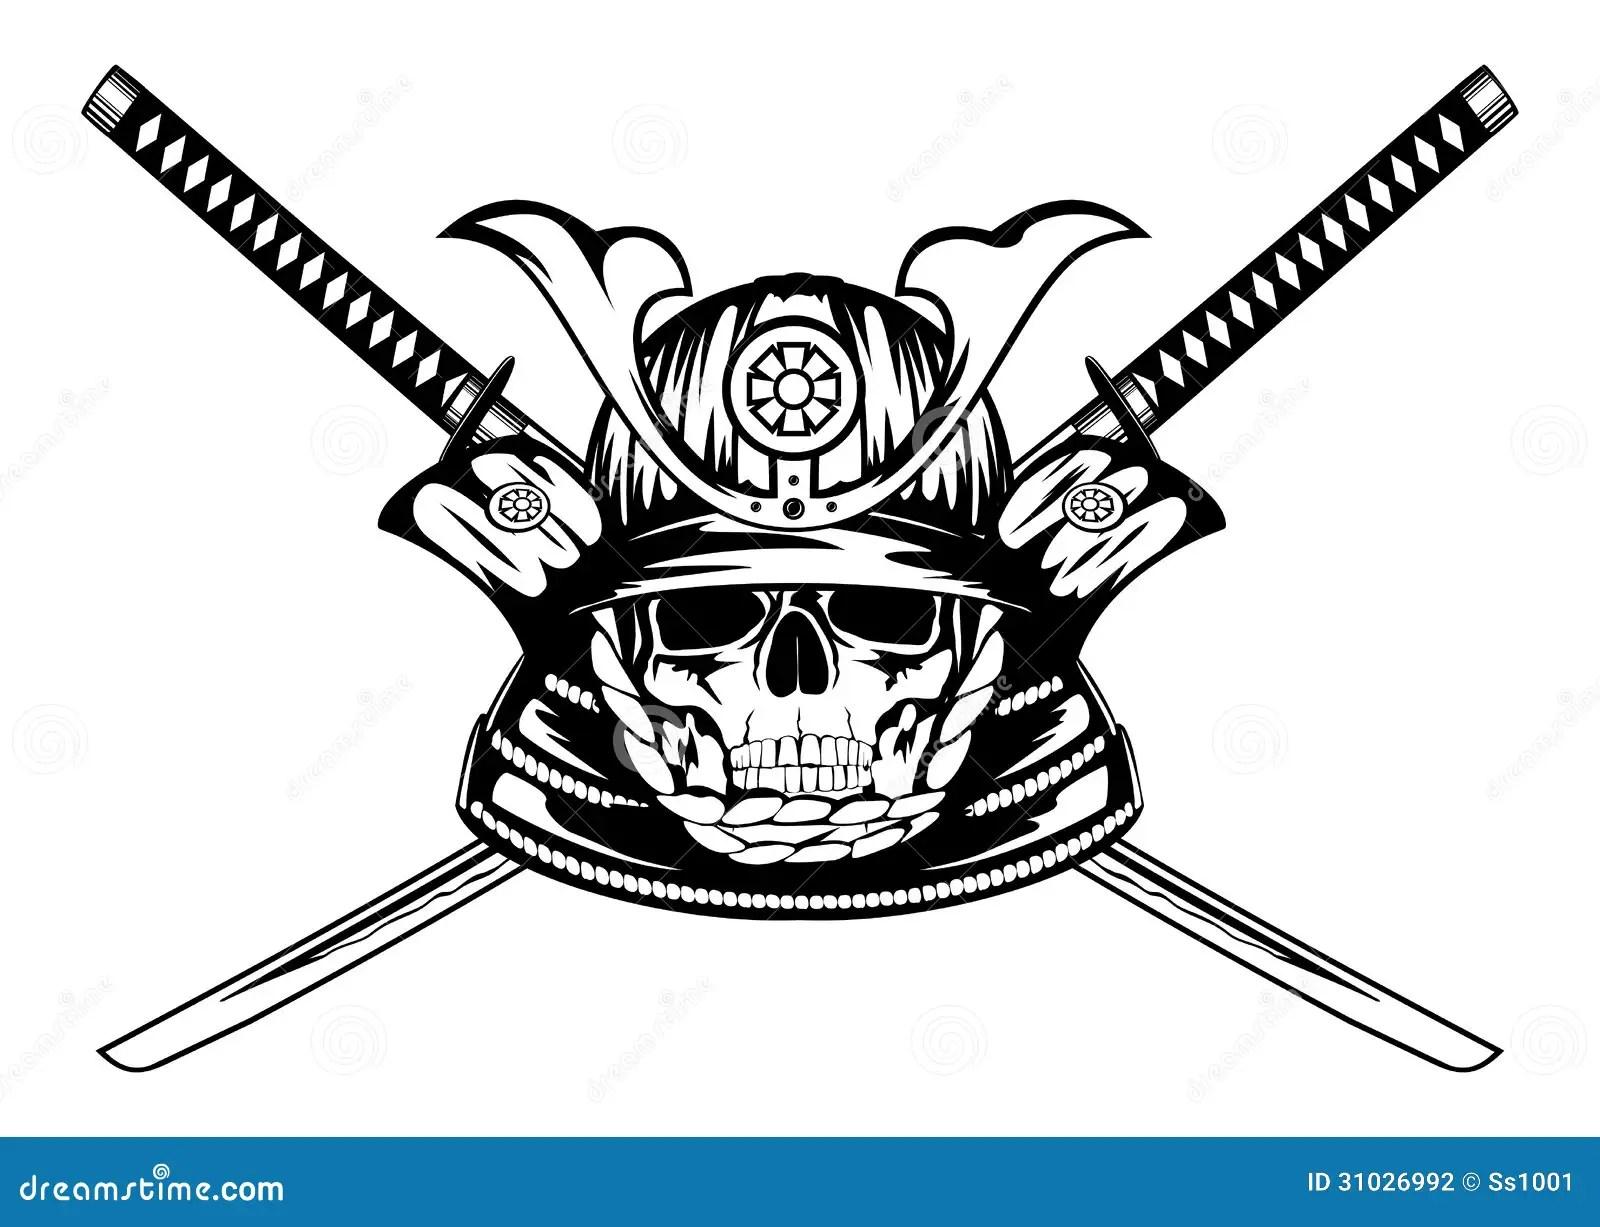 Skull In Samurai Helmet And Crossed Katanas Stock Vector